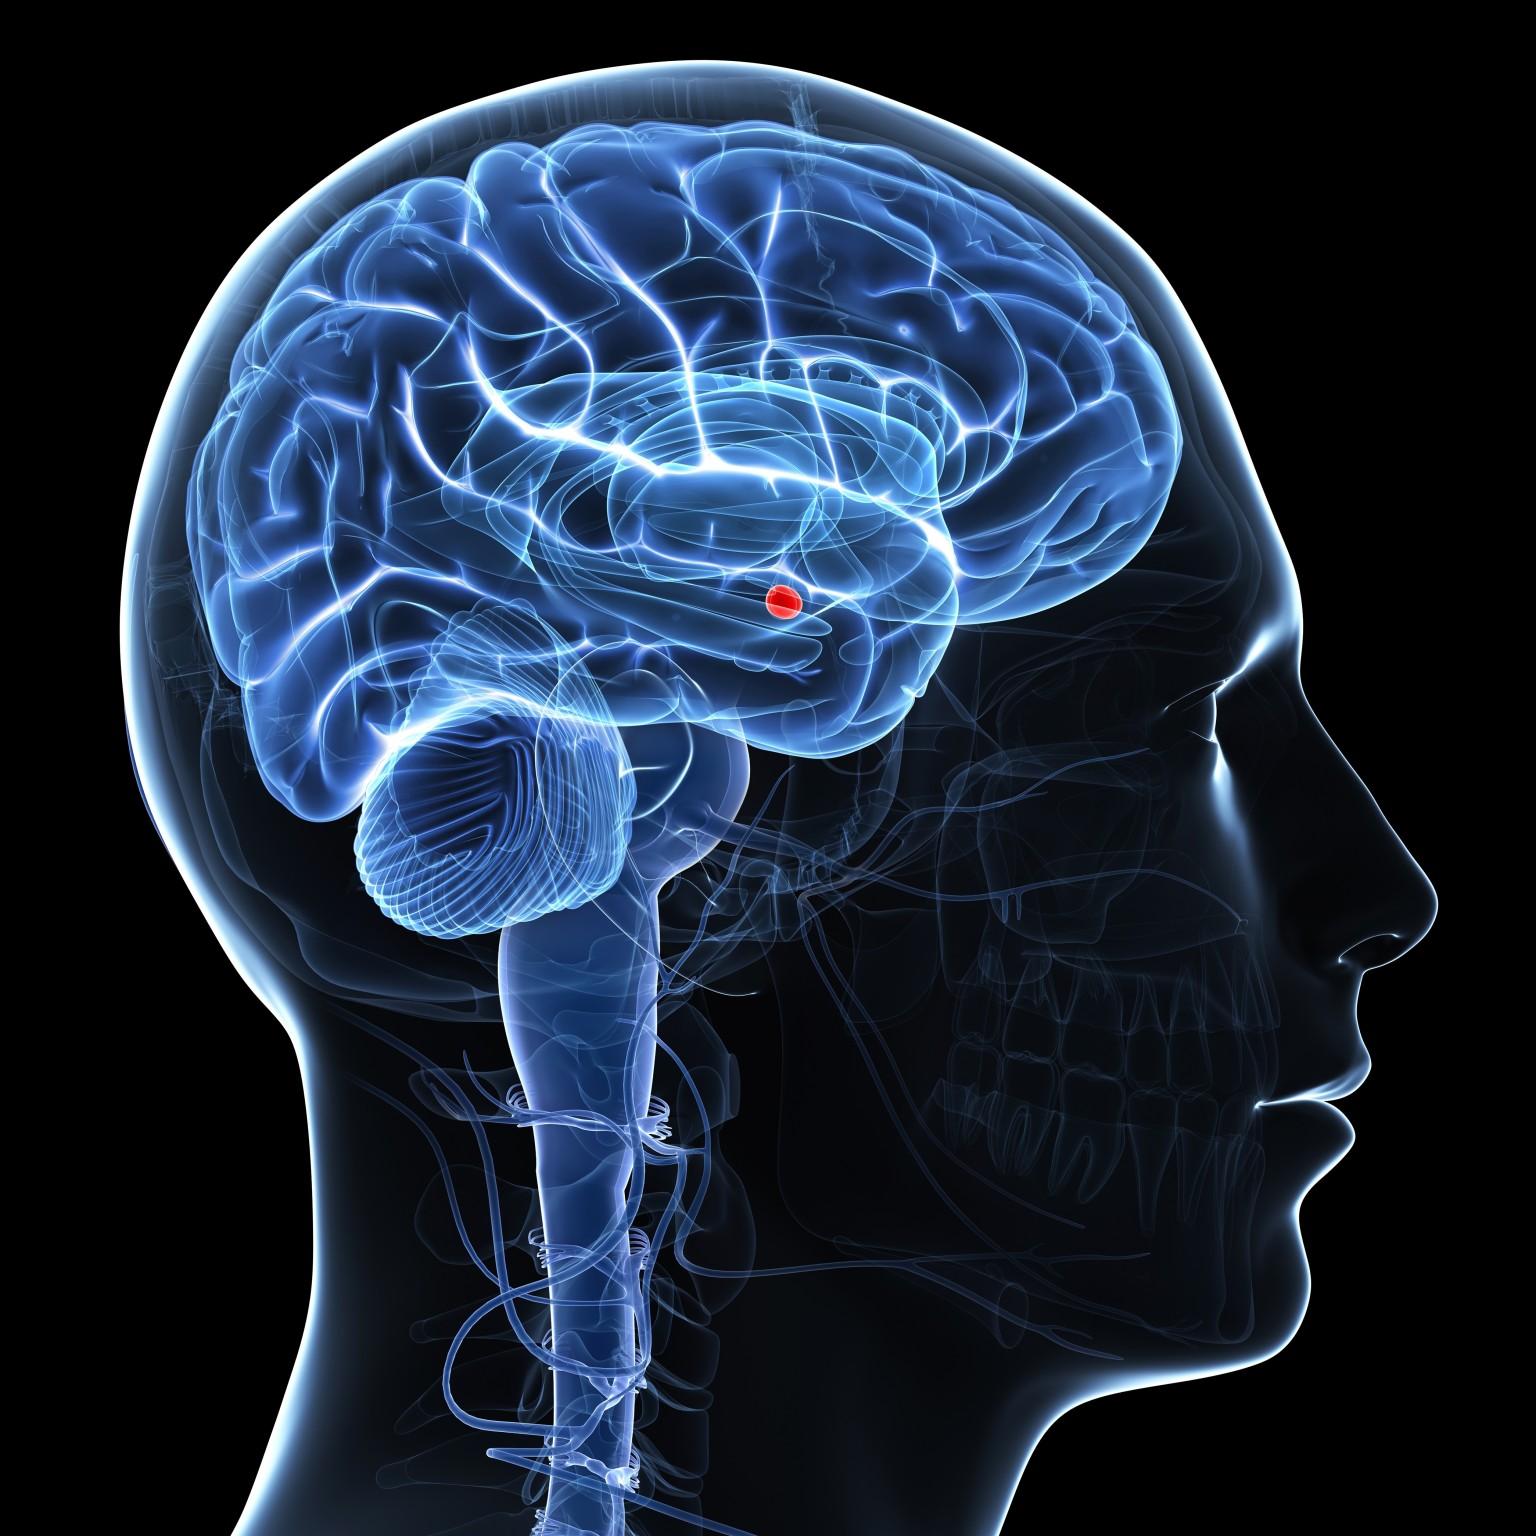 La amygdala del cerebro